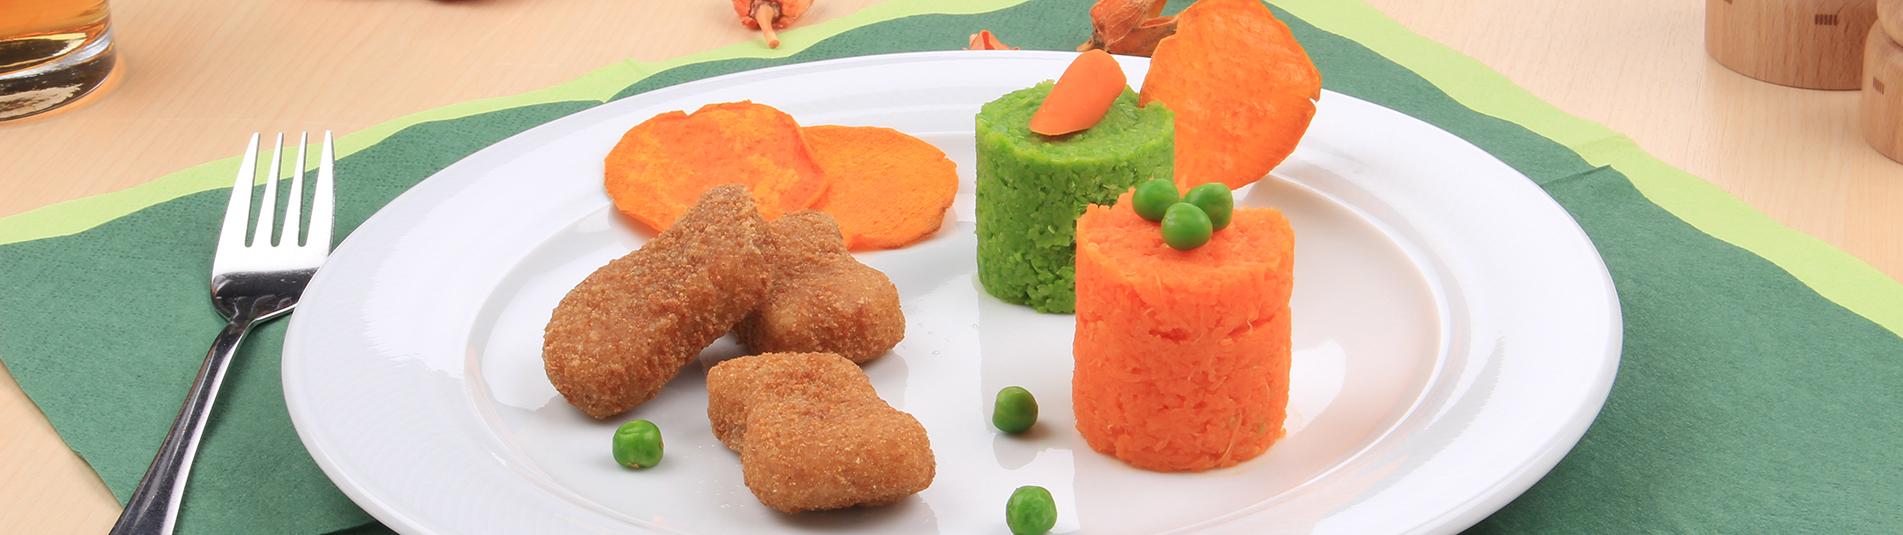 Iglo Karotten Erbsen Pueree mit Vollkorn Hühner Nuggets